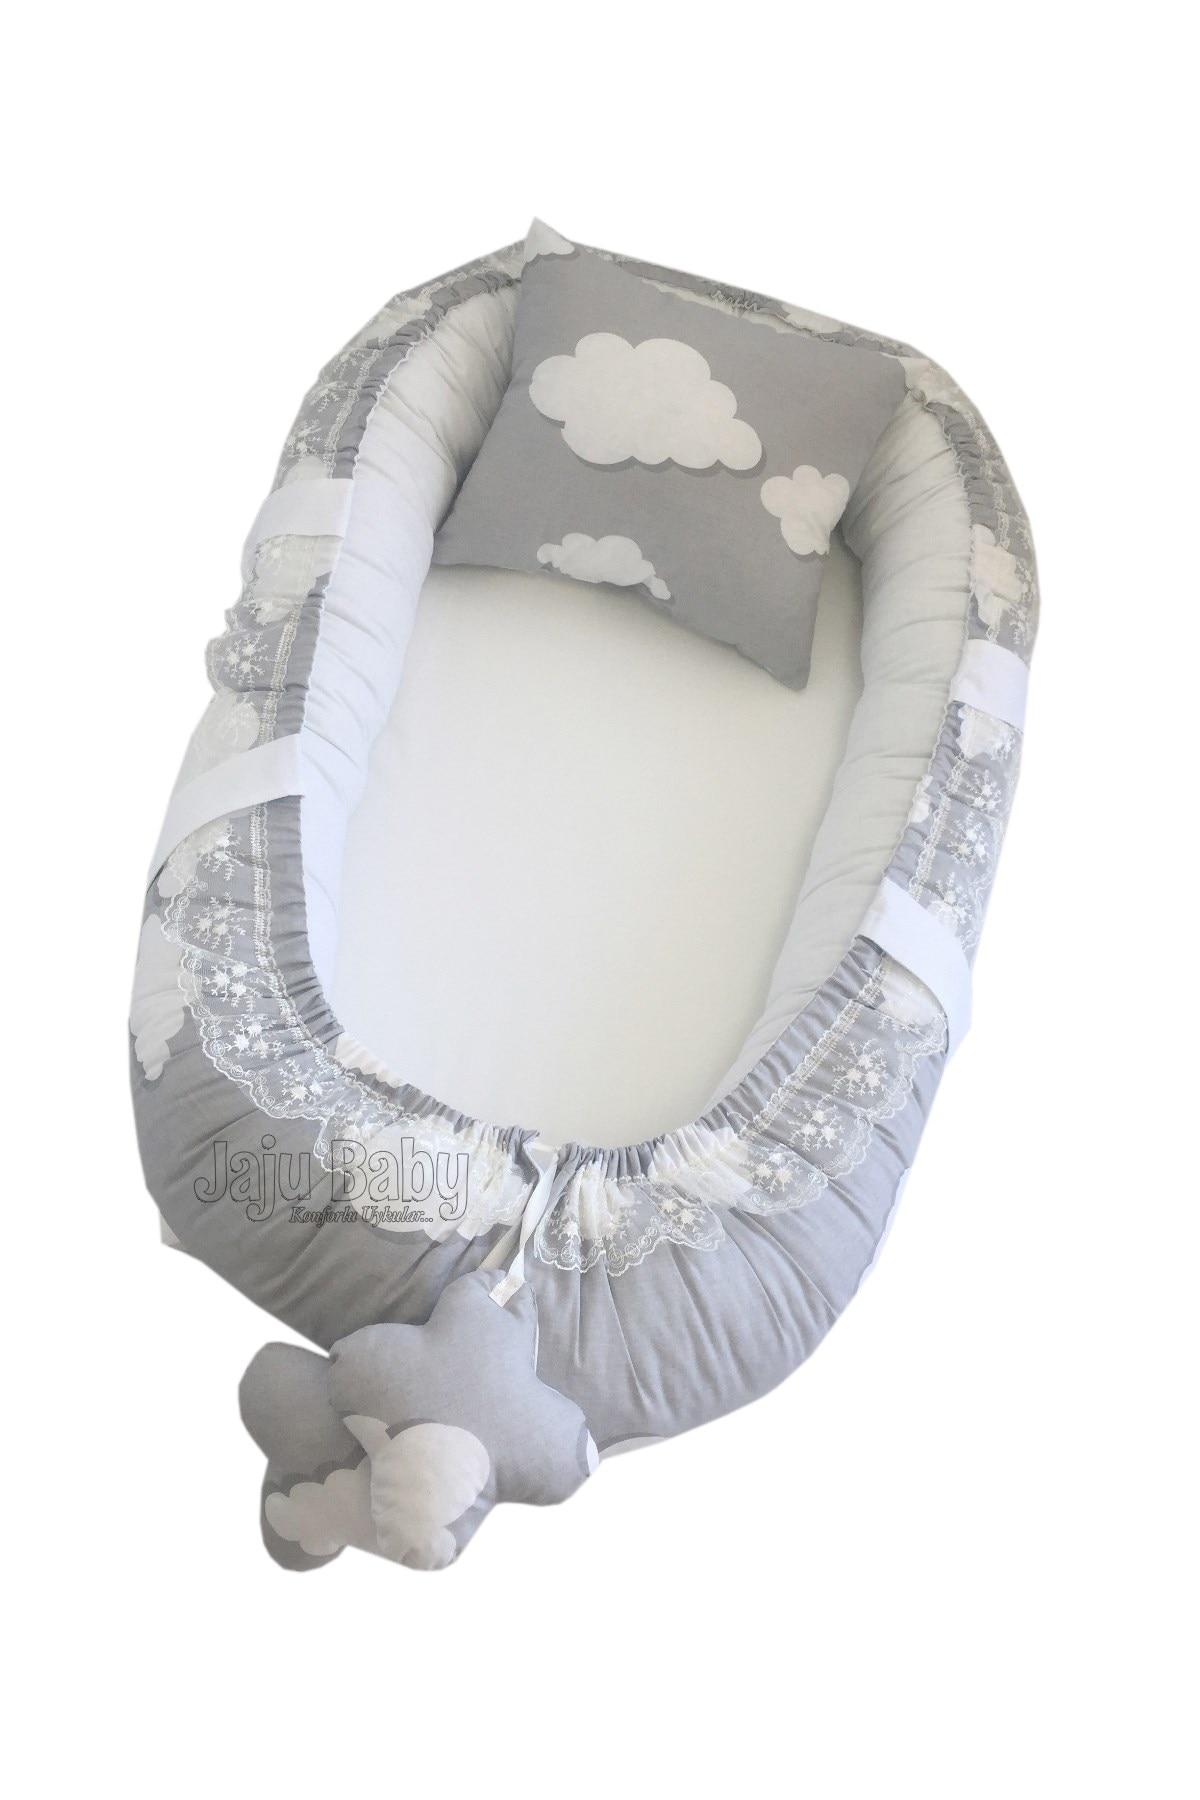 Jaju Baby nest Gray Cloudy Orthopedic Luxury BabyNest Baby Bedding